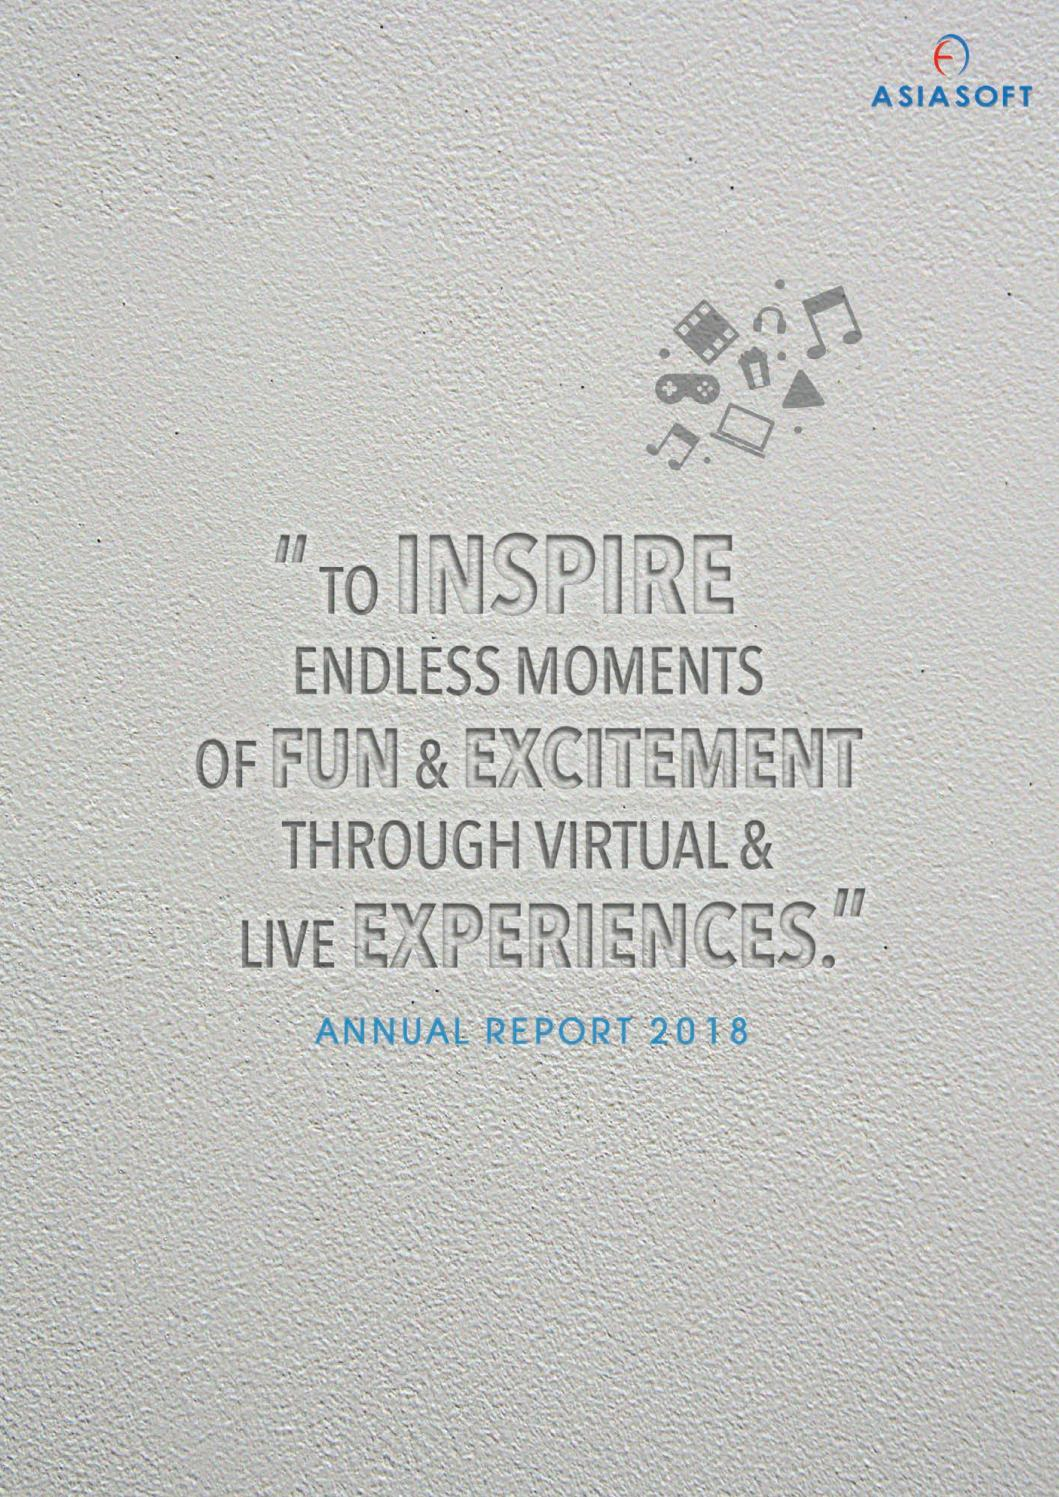 Annual Report 2018 by shareinvestor shareinvestor - issuu